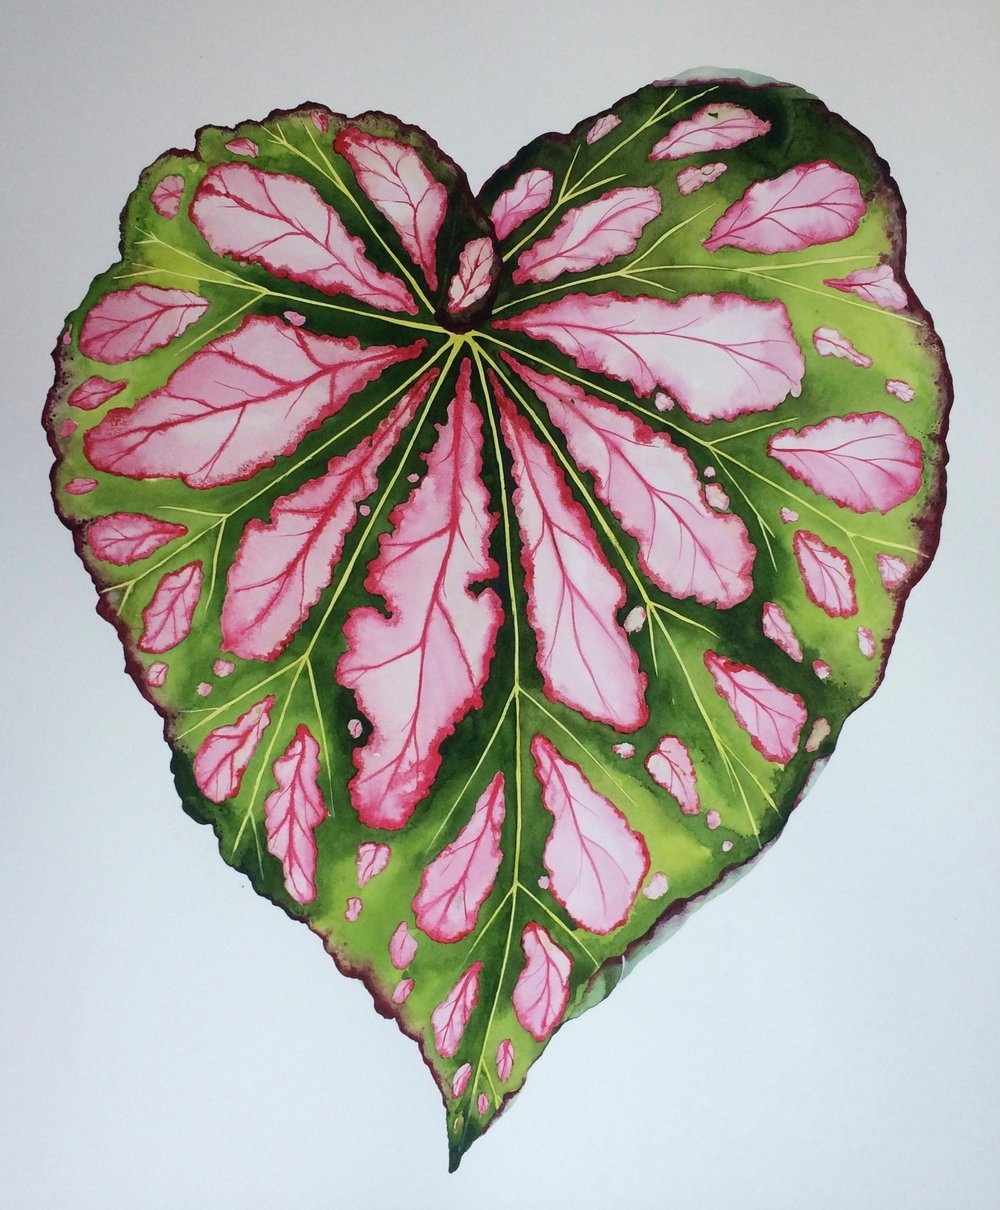 Idoline Duke  Big Begonia Leaf  watercolor on paper 35 x 30 in.